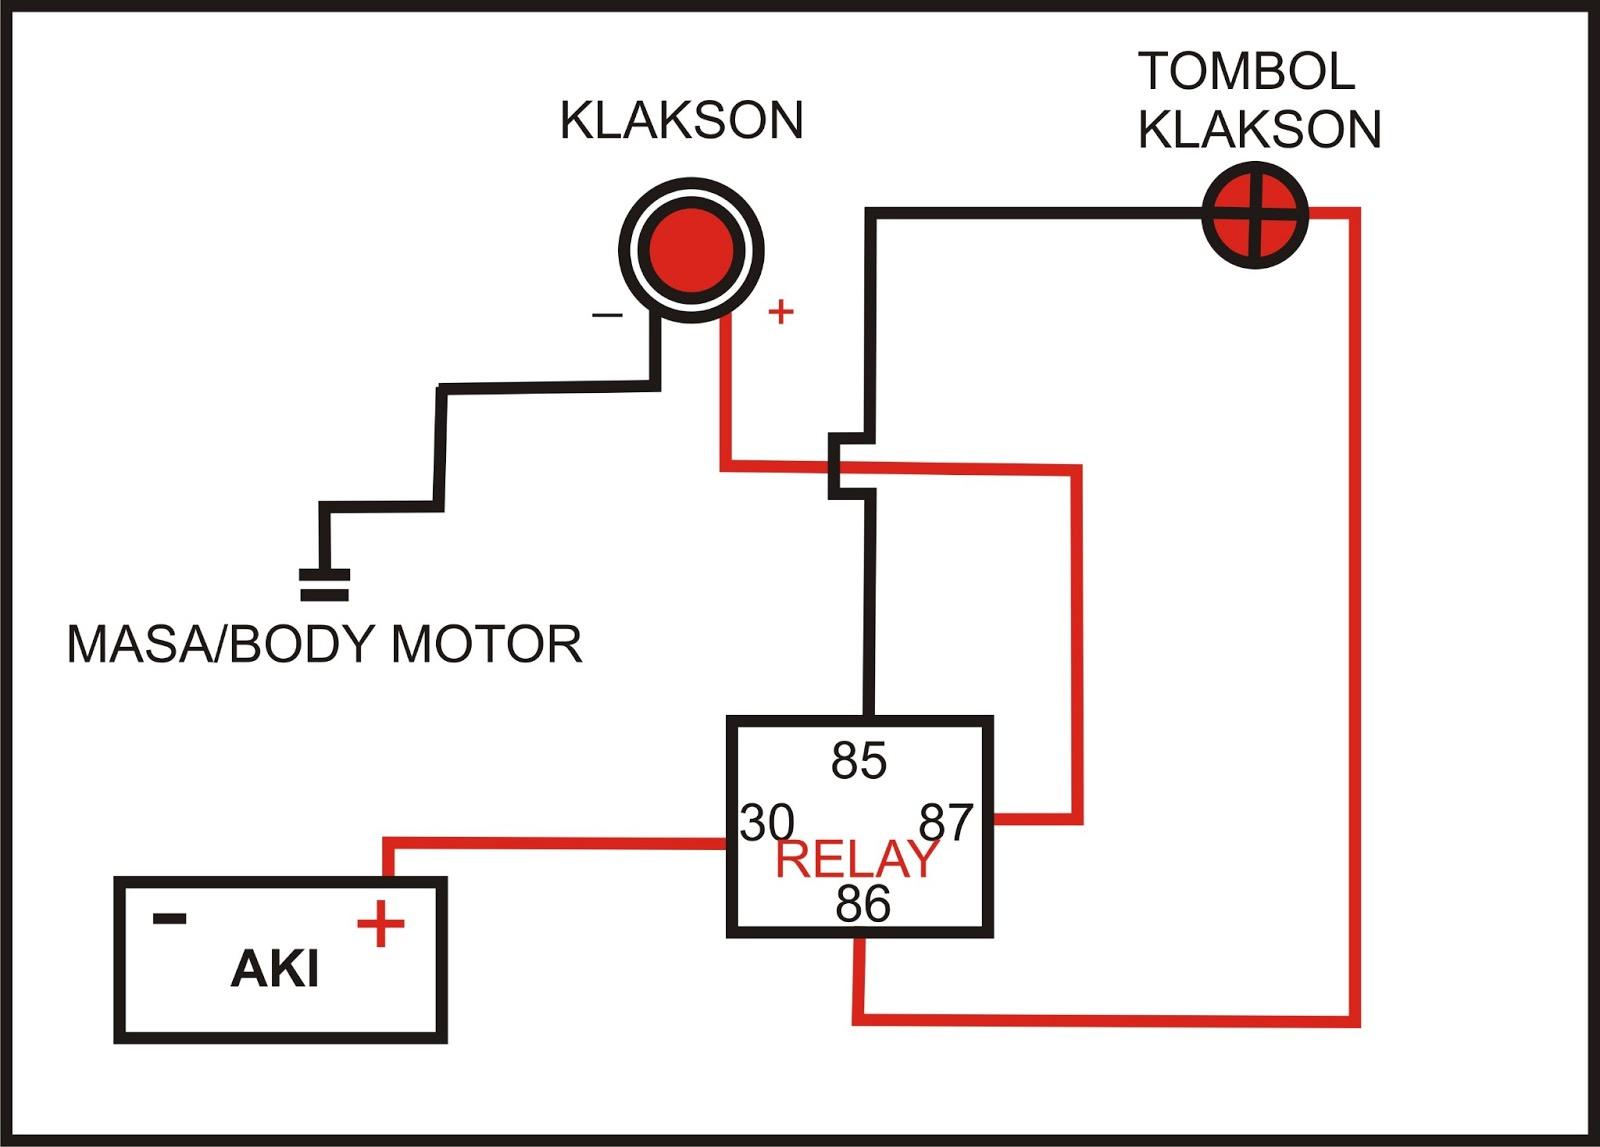 1022 wiring diagram kelistrikan kapal wiring diagram kelistrikan wiring diagram kelistrikan kapal image collections asfbconference2016 Choice Image